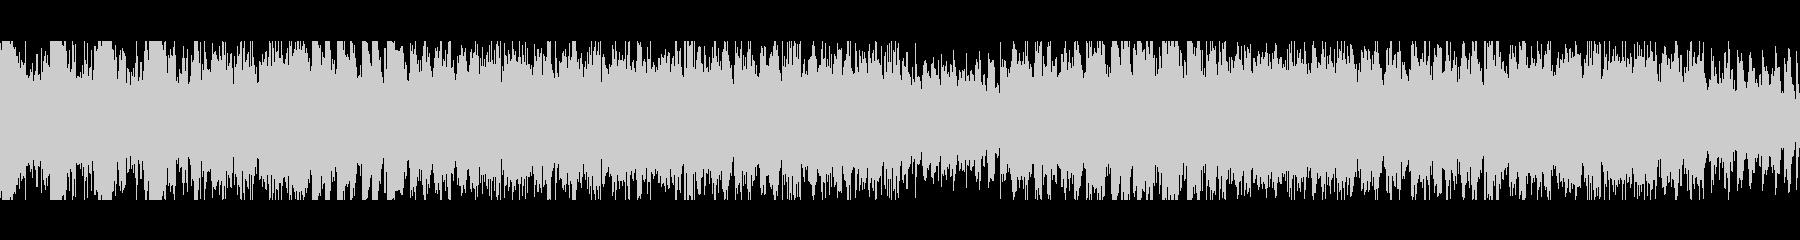 Lo-Fi HipHopのBGM用2の未再生の波形